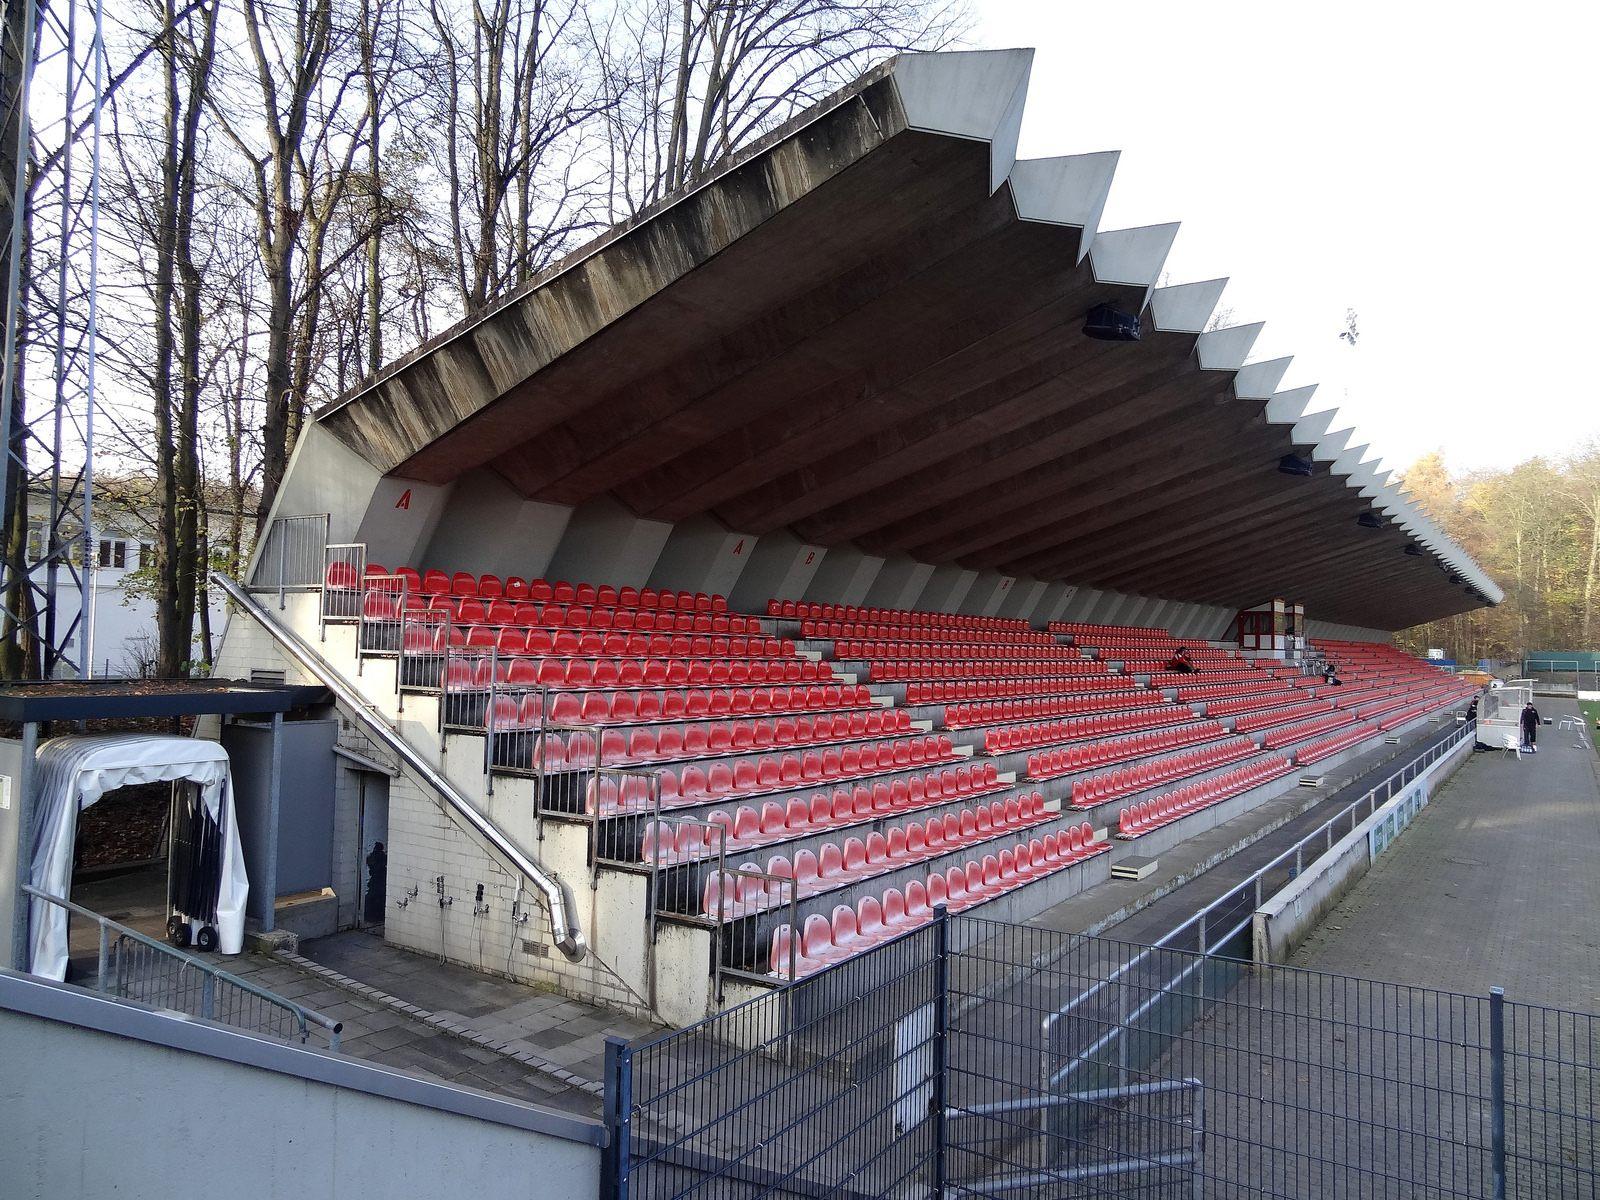 franz_kremer_stadion04.jpg